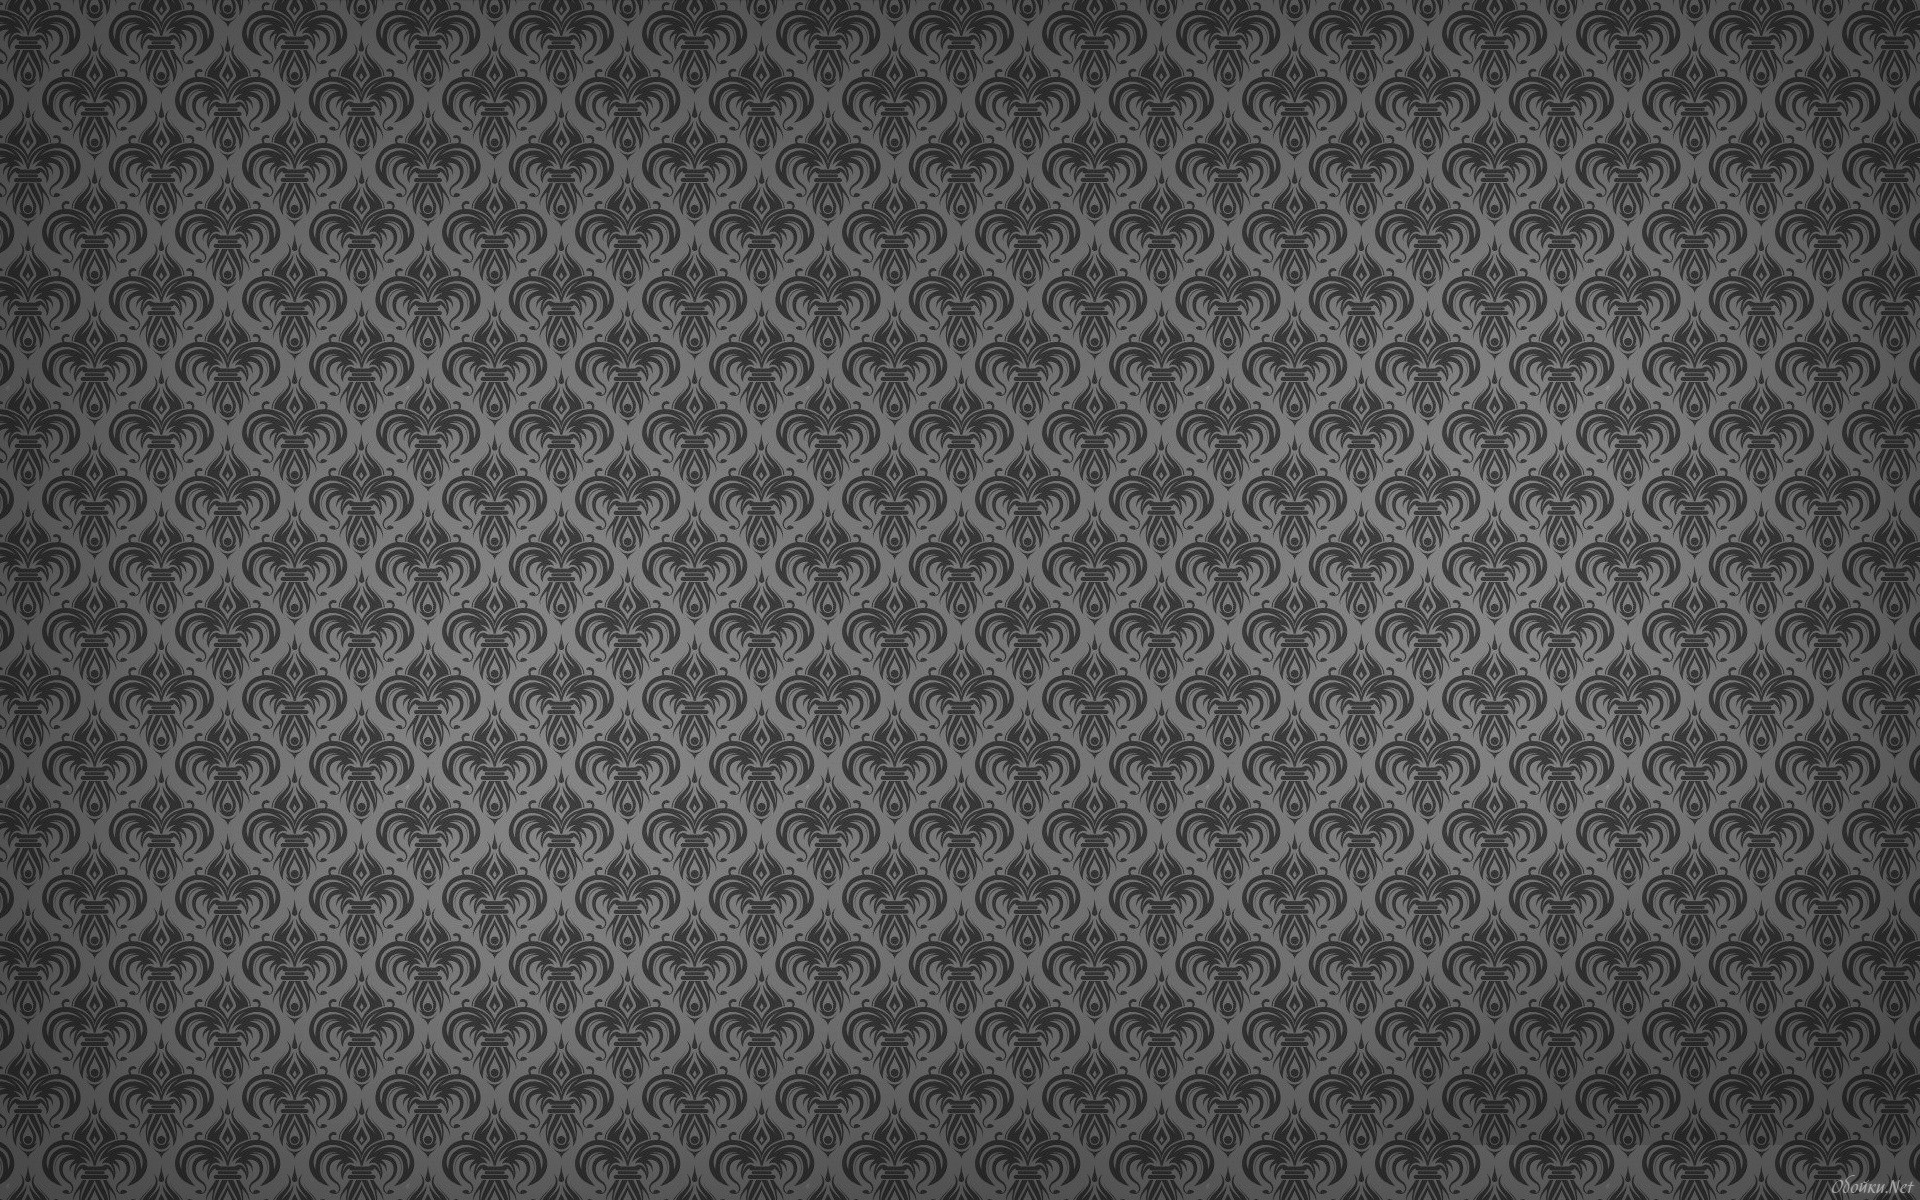 [Resim: ornaments_texture1104jbuc7.jpg]